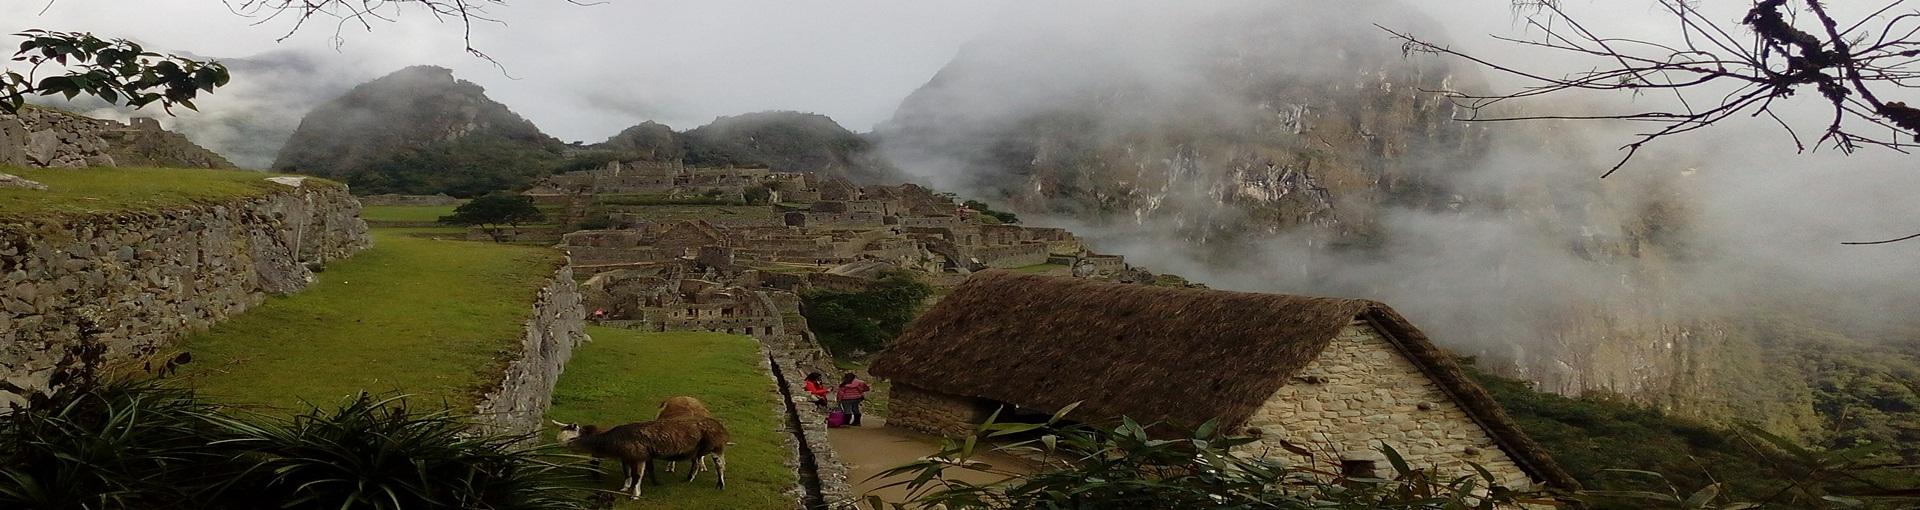 Salkantay & Inca Trail to Machu Picchu 7D/6N